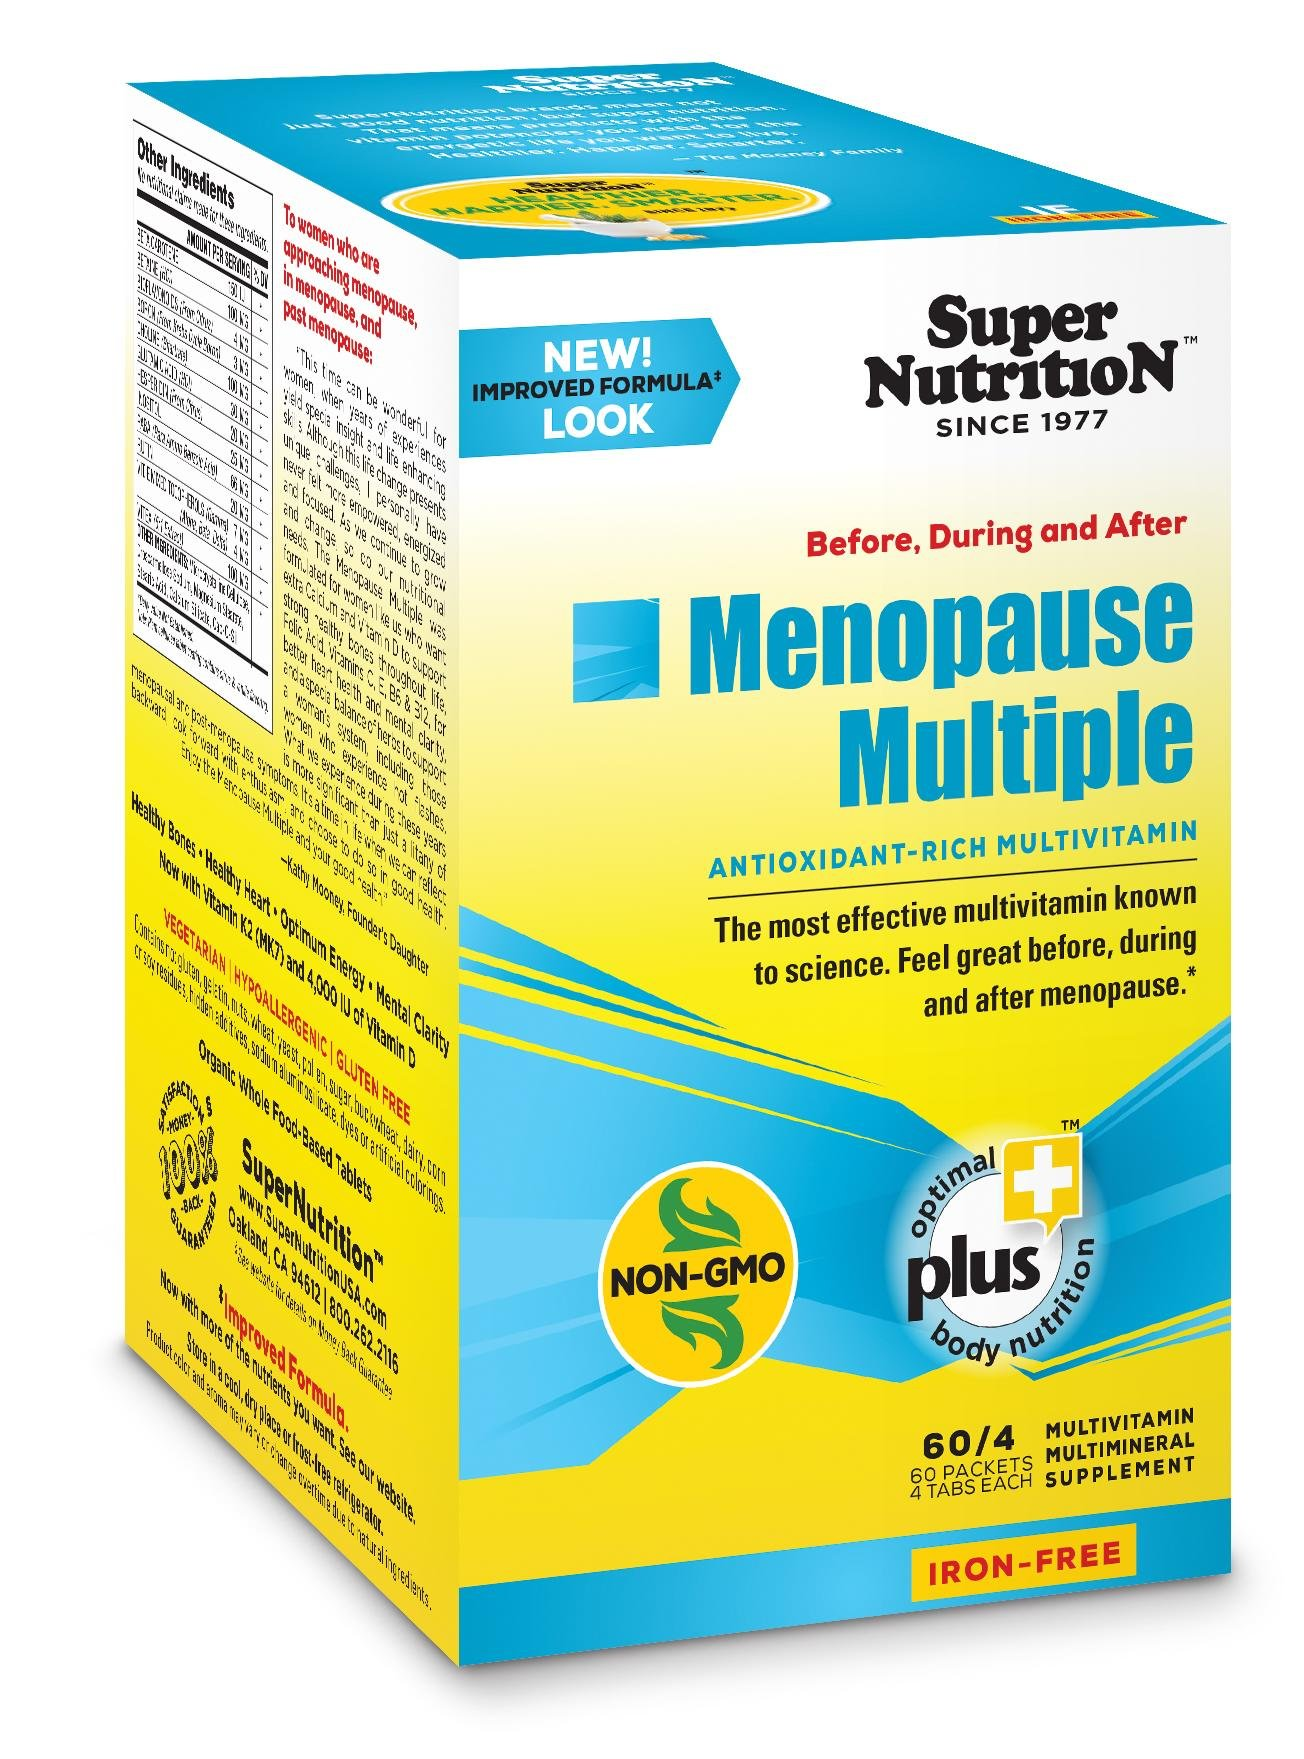 Supernutrition Menopause Multiple Iron Free Multivitamin